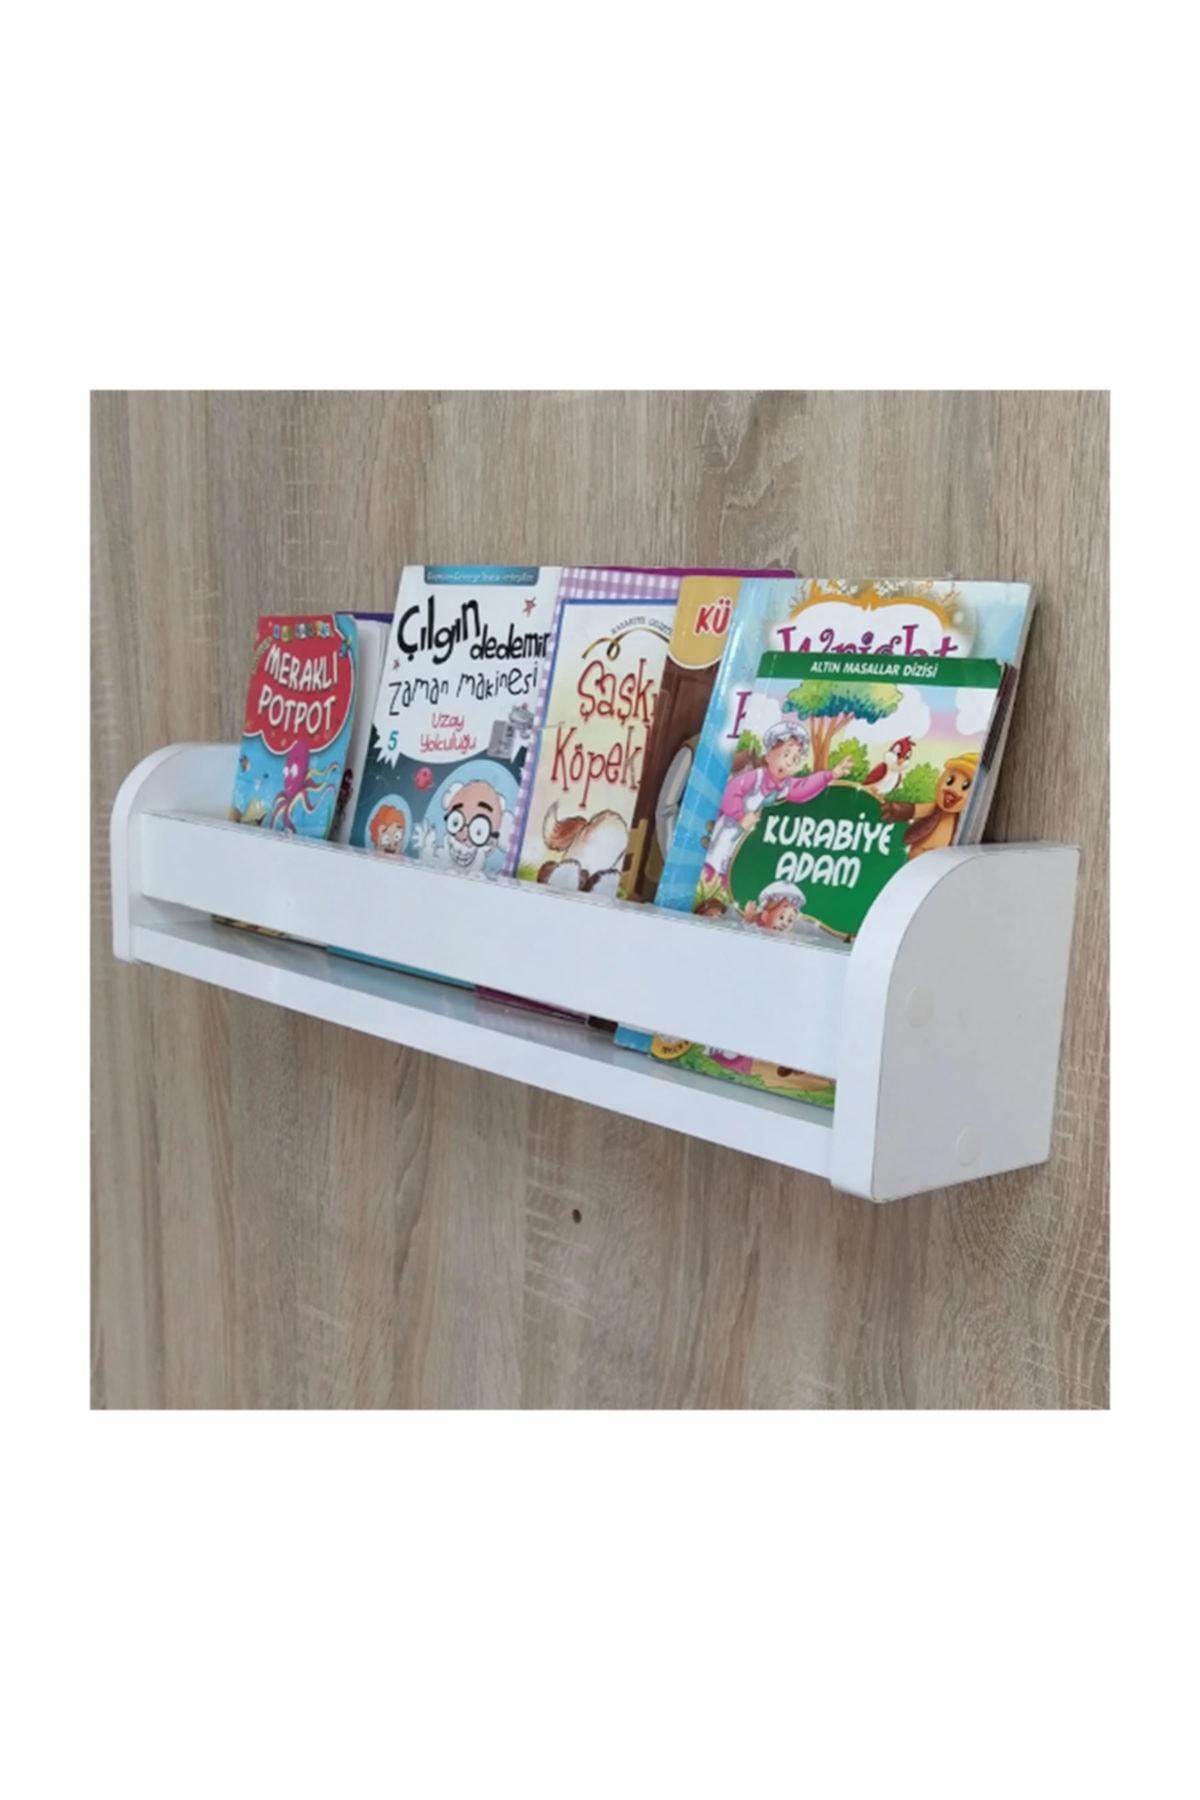 Kids Room Wood Single Shelf book rack, corner, cabinets, bookcase, shelves, libraries